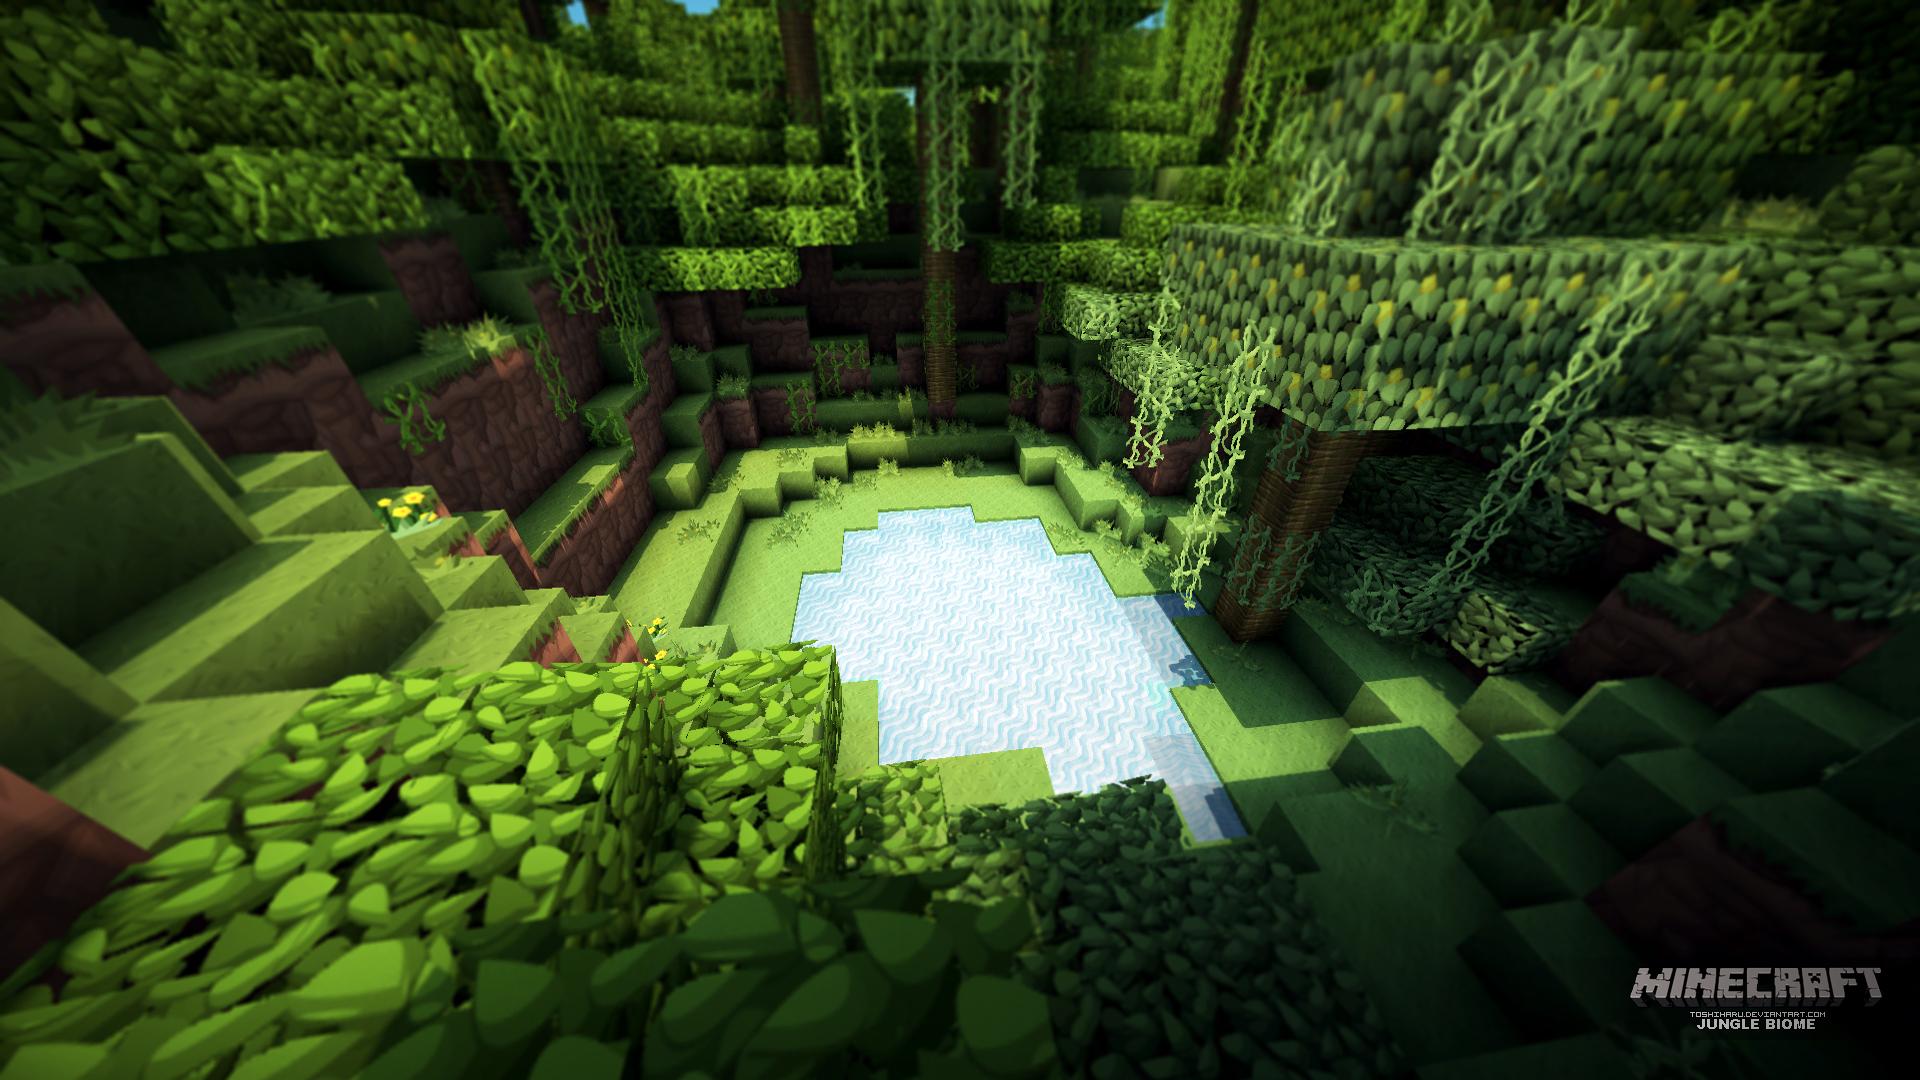 Beautiful Wallpaper Minecraft Forest - 741d0c7f-c909-4ad0-ad38-39312cb0dc0f  Graphic_391613.jpg